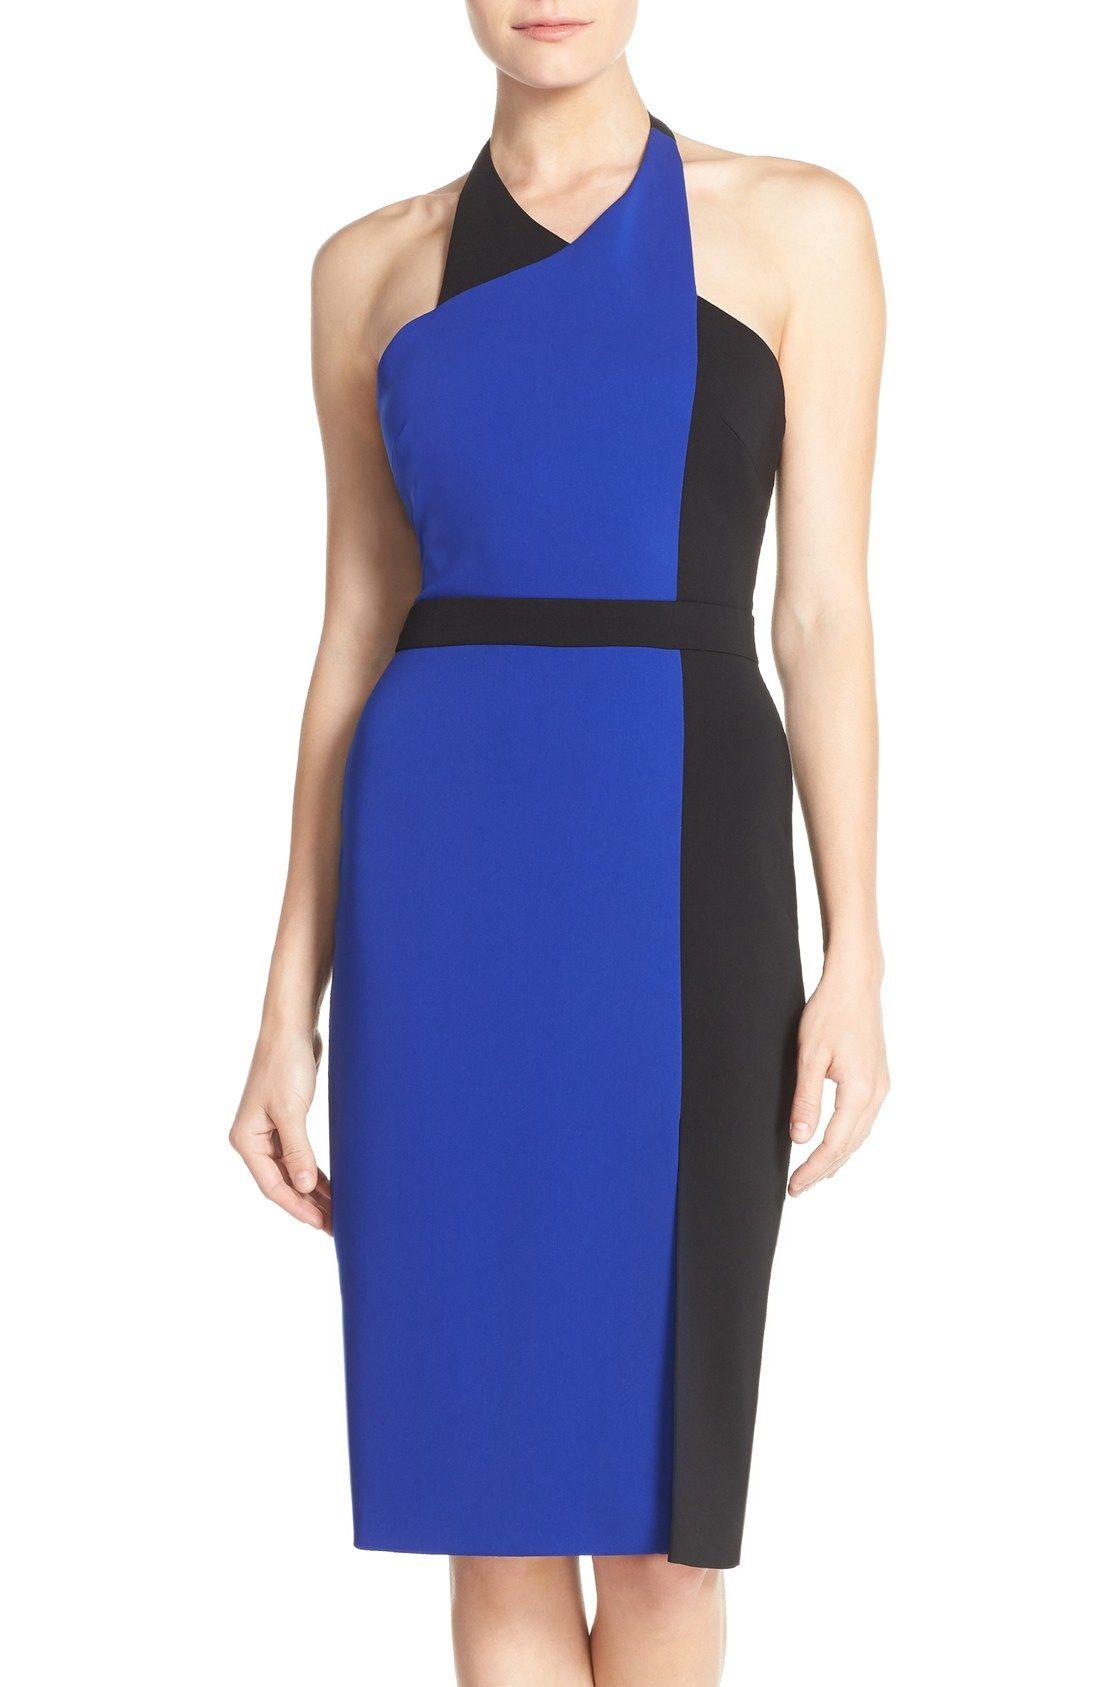 Badgley Mischka Colorblock Halter Dress available at #Nordstrom ...